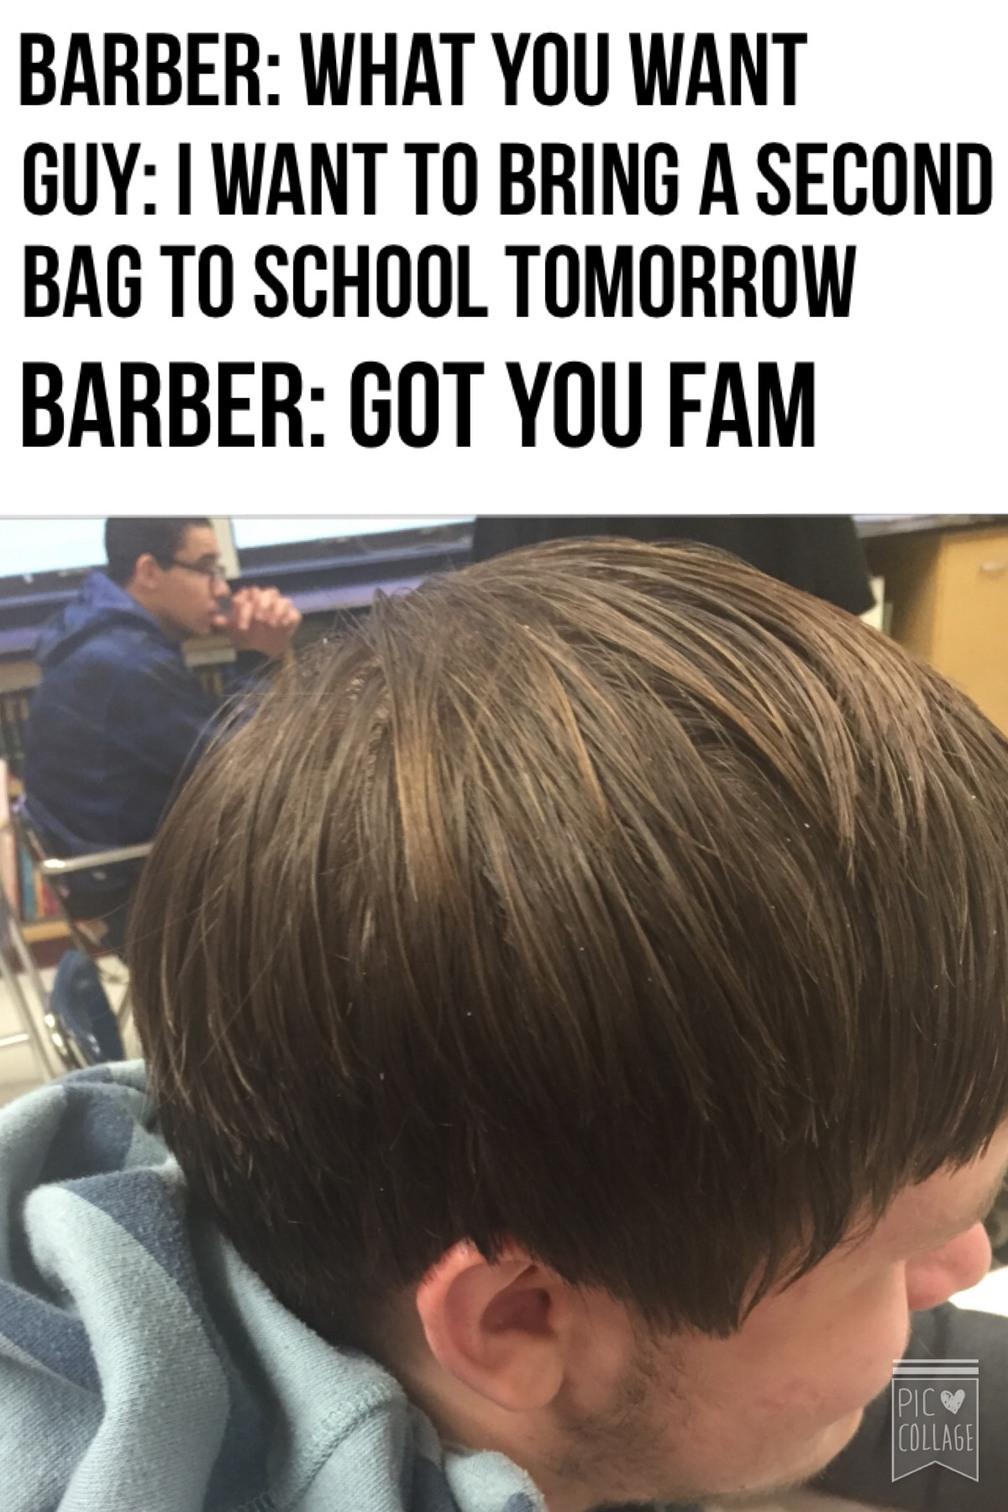 second bag - meme